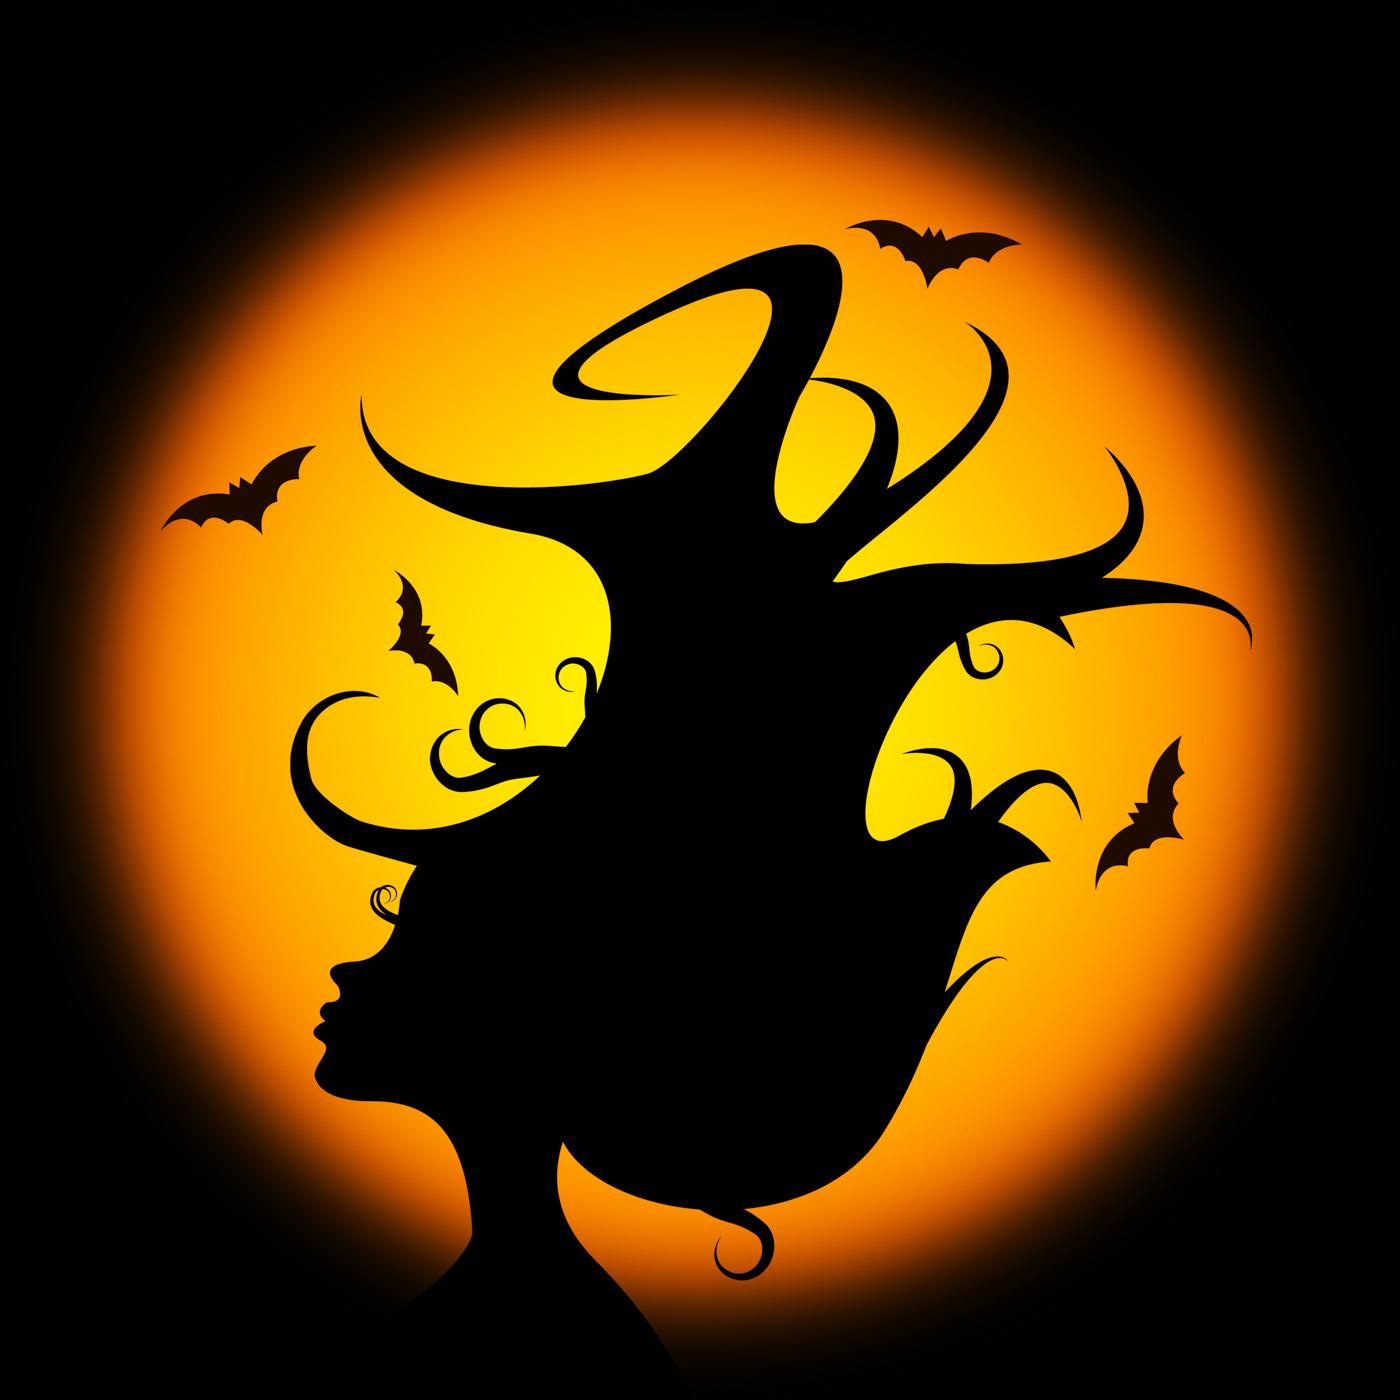 Bat halloween represents trick or treat and animal photo